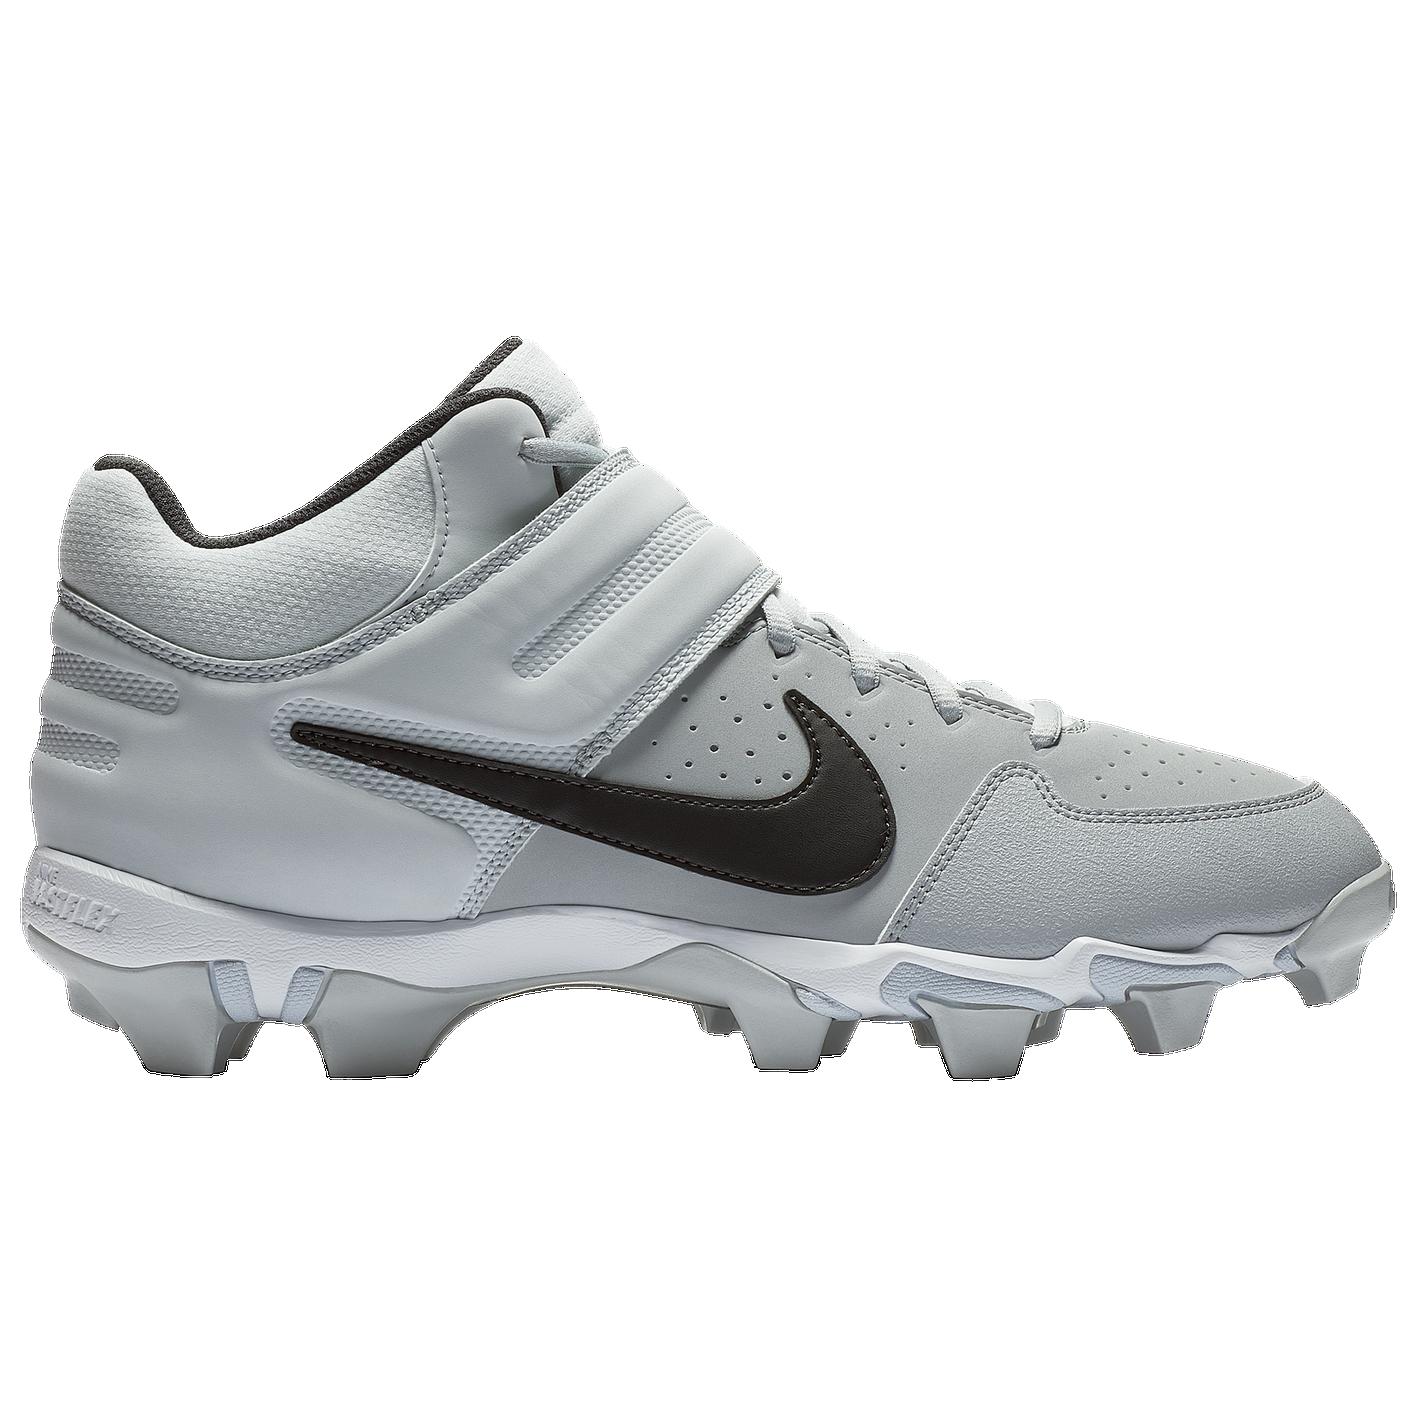 5aa1d93c1d36 Nike Alpha Huarache Varsity Mid Keystone - Men's - Baseball - Shoes ...